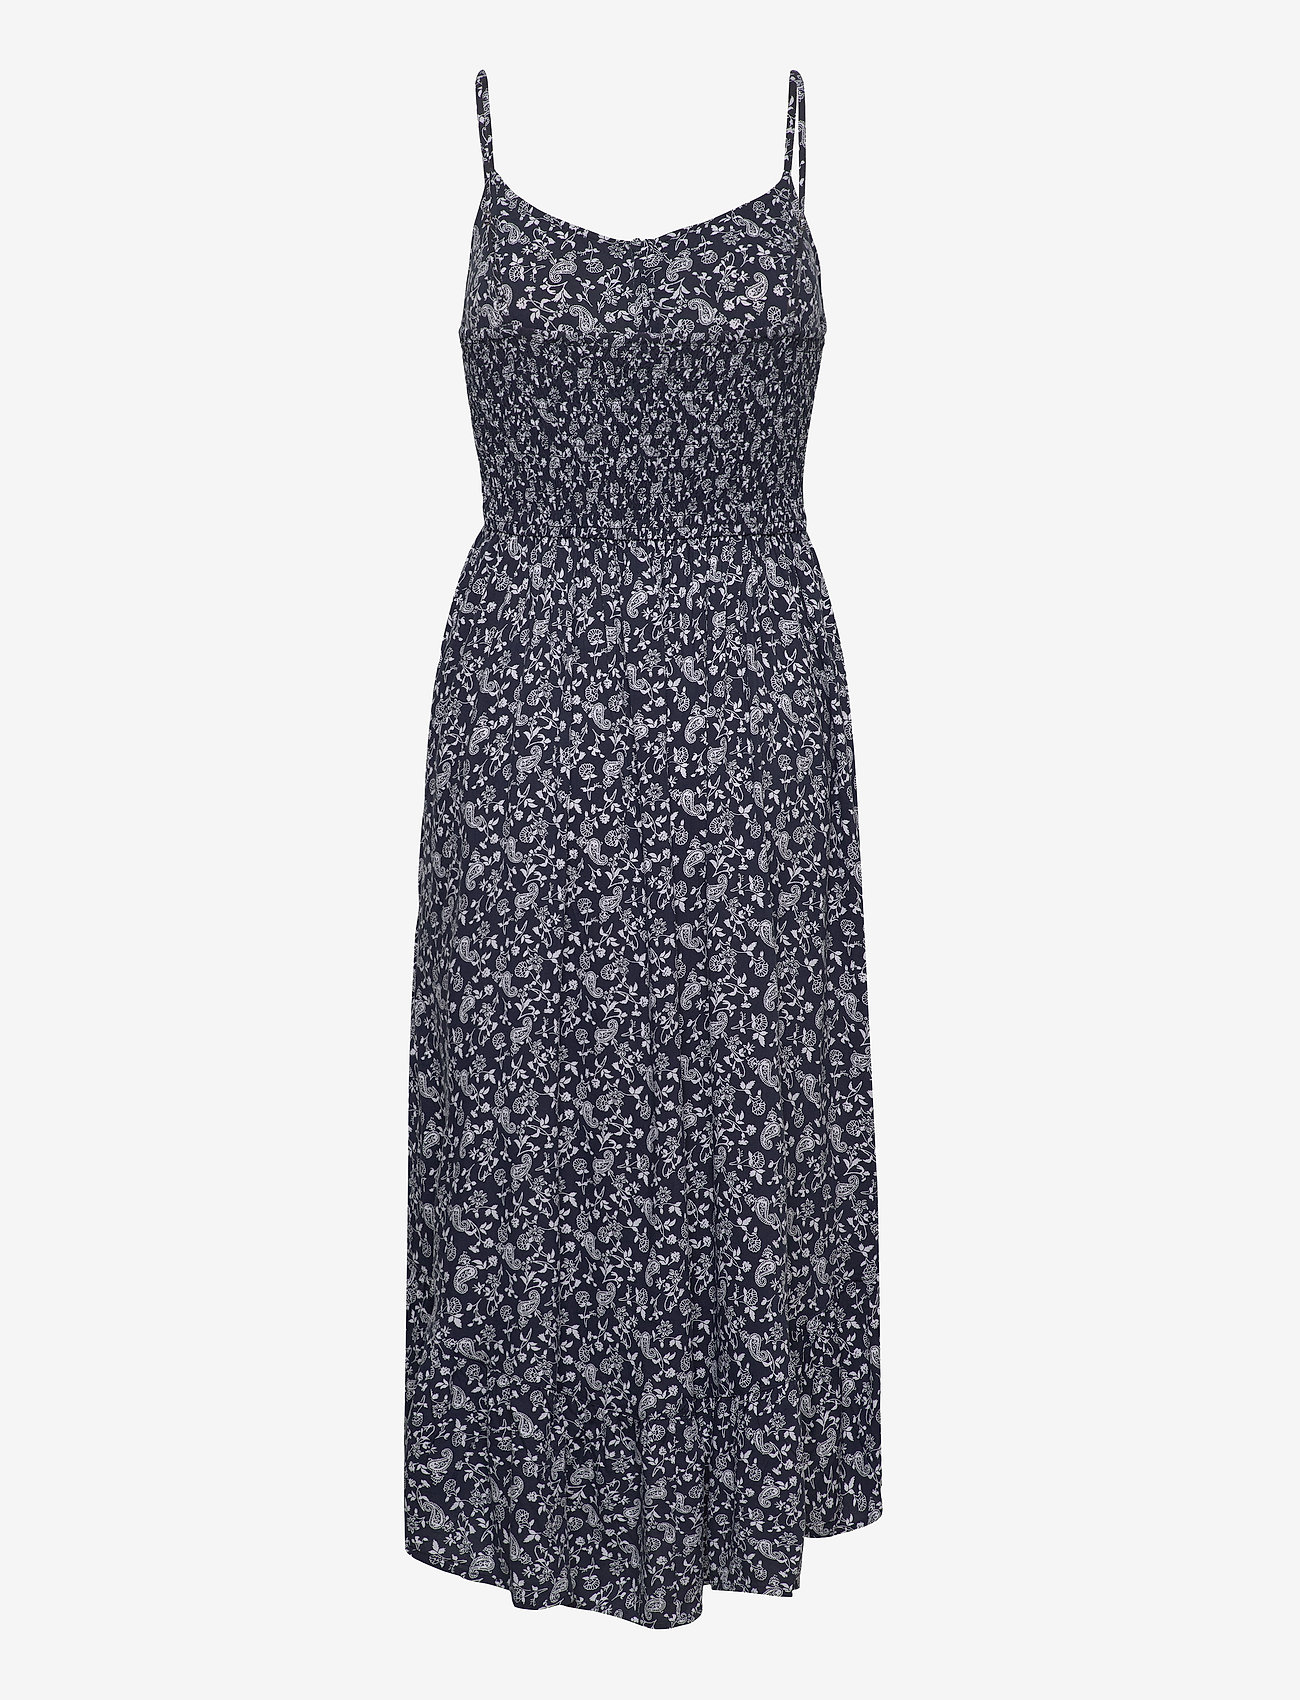 Hollister Bare Pretty Midi Dress - Dresses